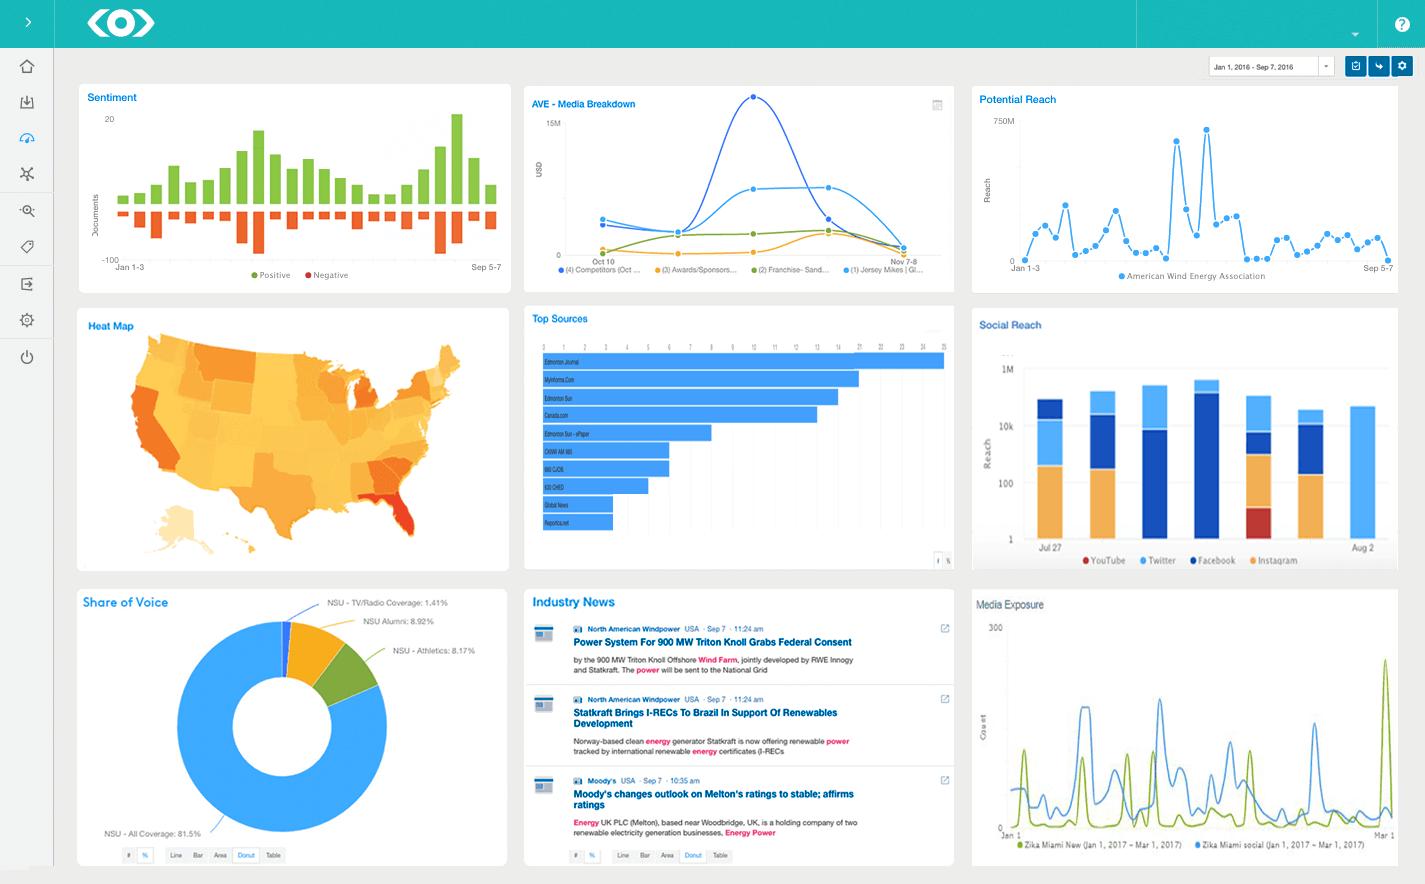 Сводка по активности в информационной среде в системе мониторинга и анализа СМИ и соцсетей Meltwater